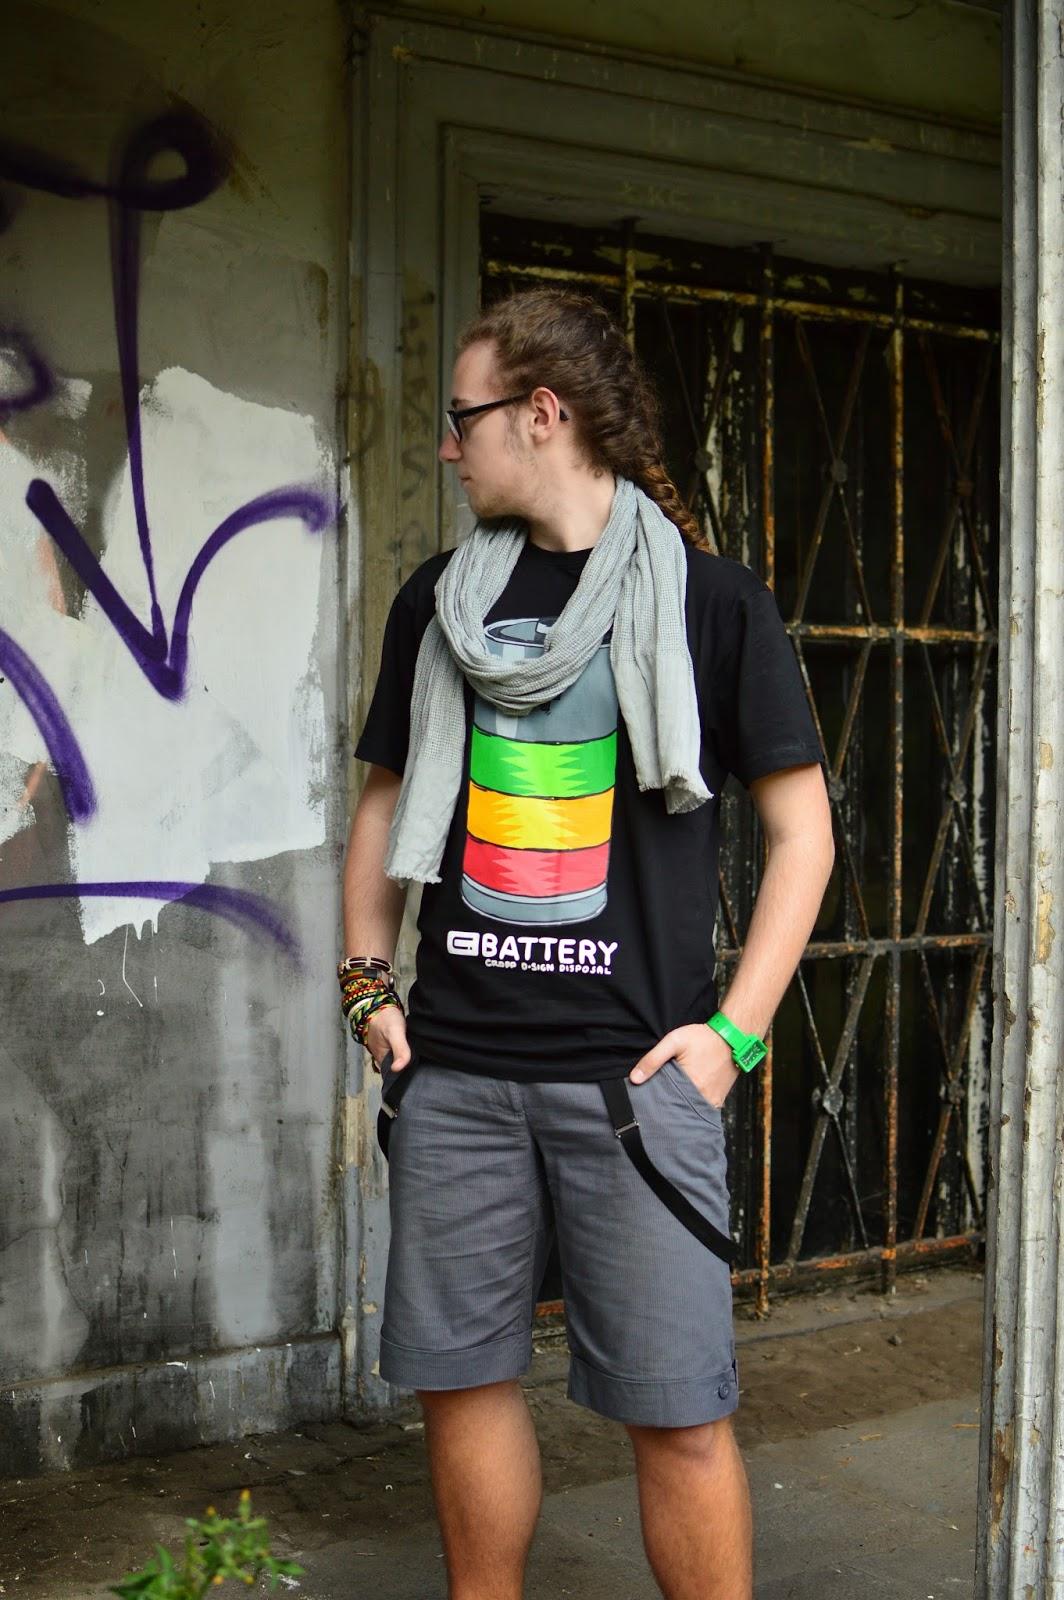 Reggae muzyka duszy dotyka, yeah!!!